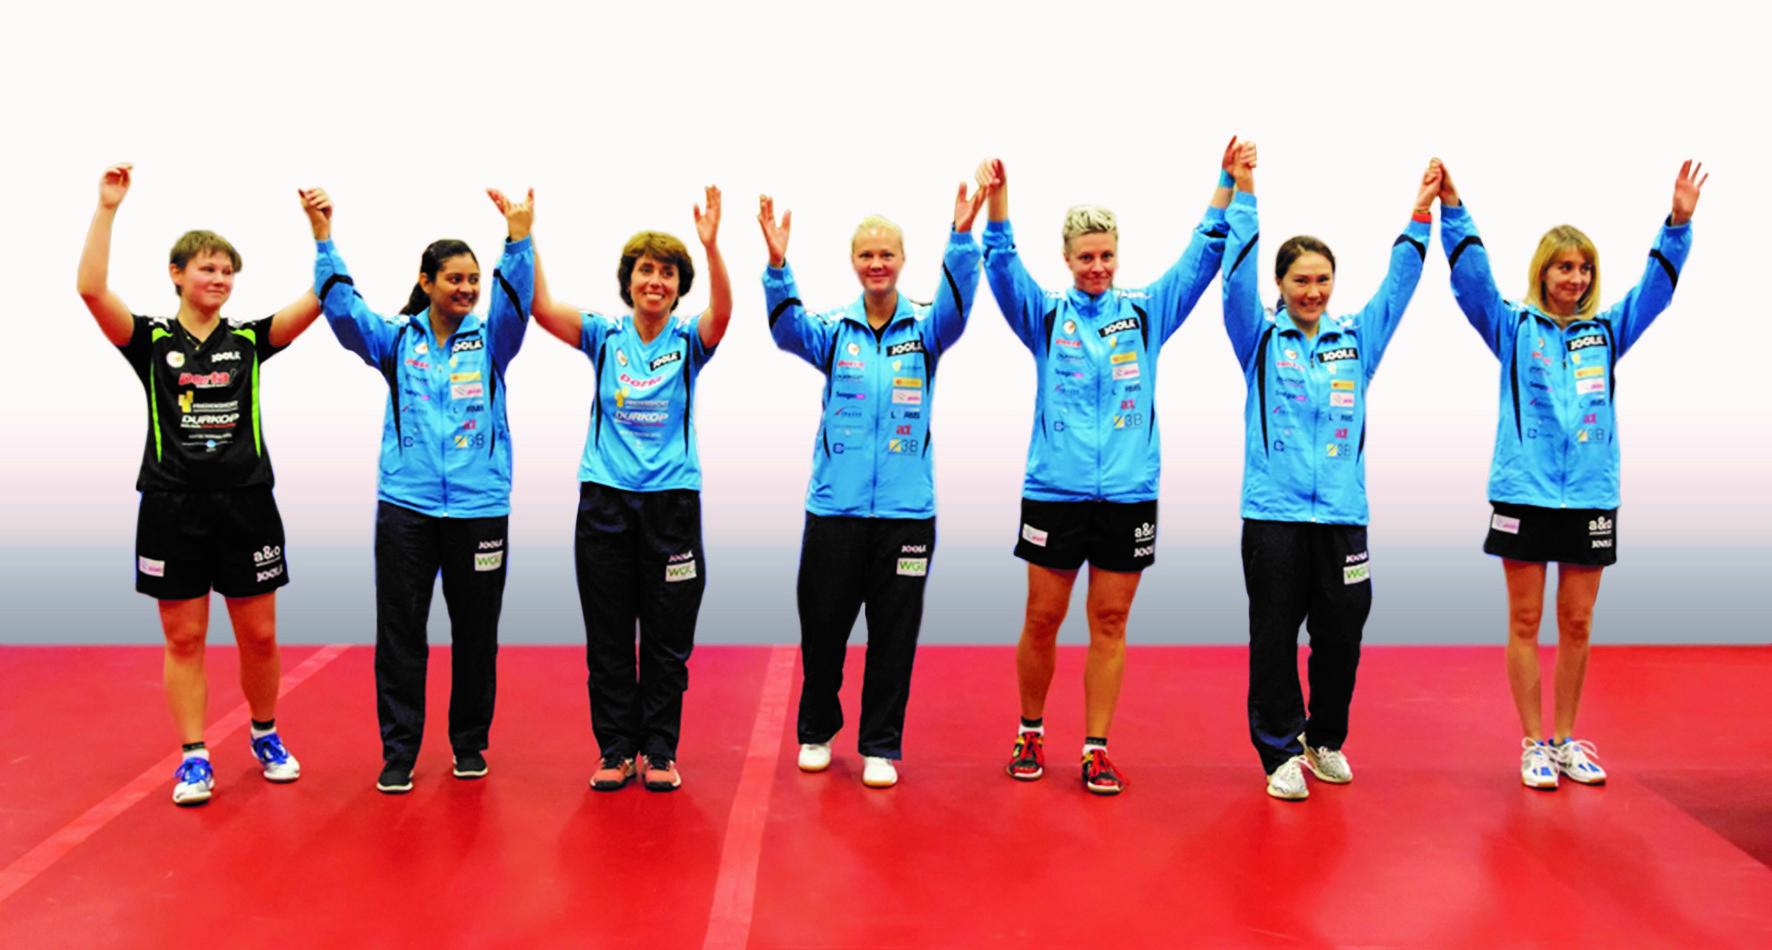 Ladies Power am Frauentag - Champions League Halbfinale